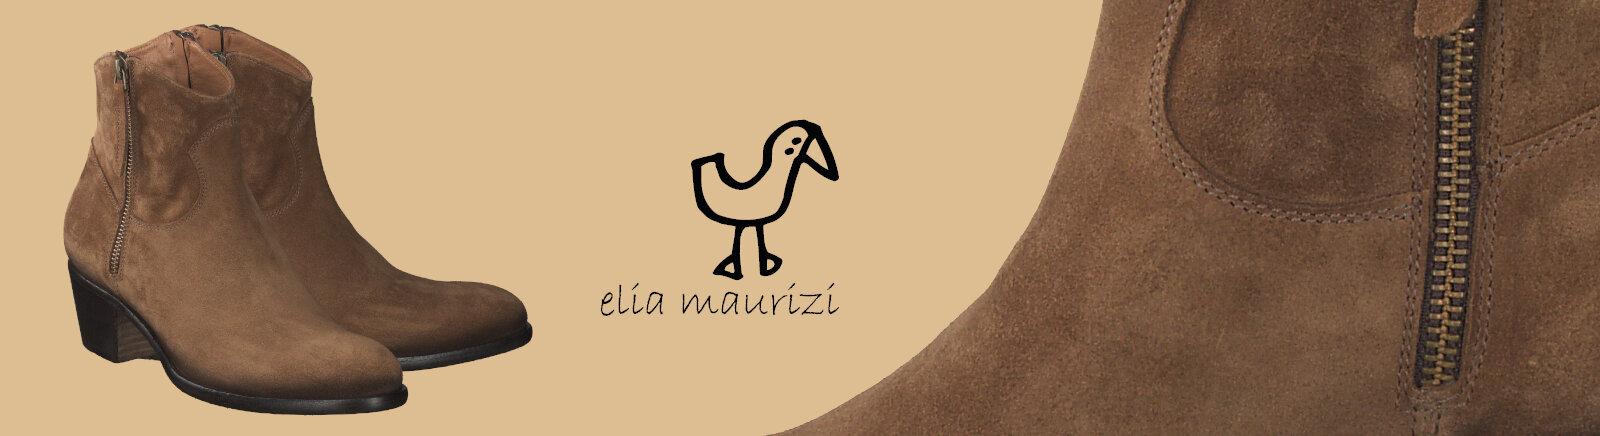 Elia Maurizi Markenschuhe online bestellen im Prange Schuhe Shop